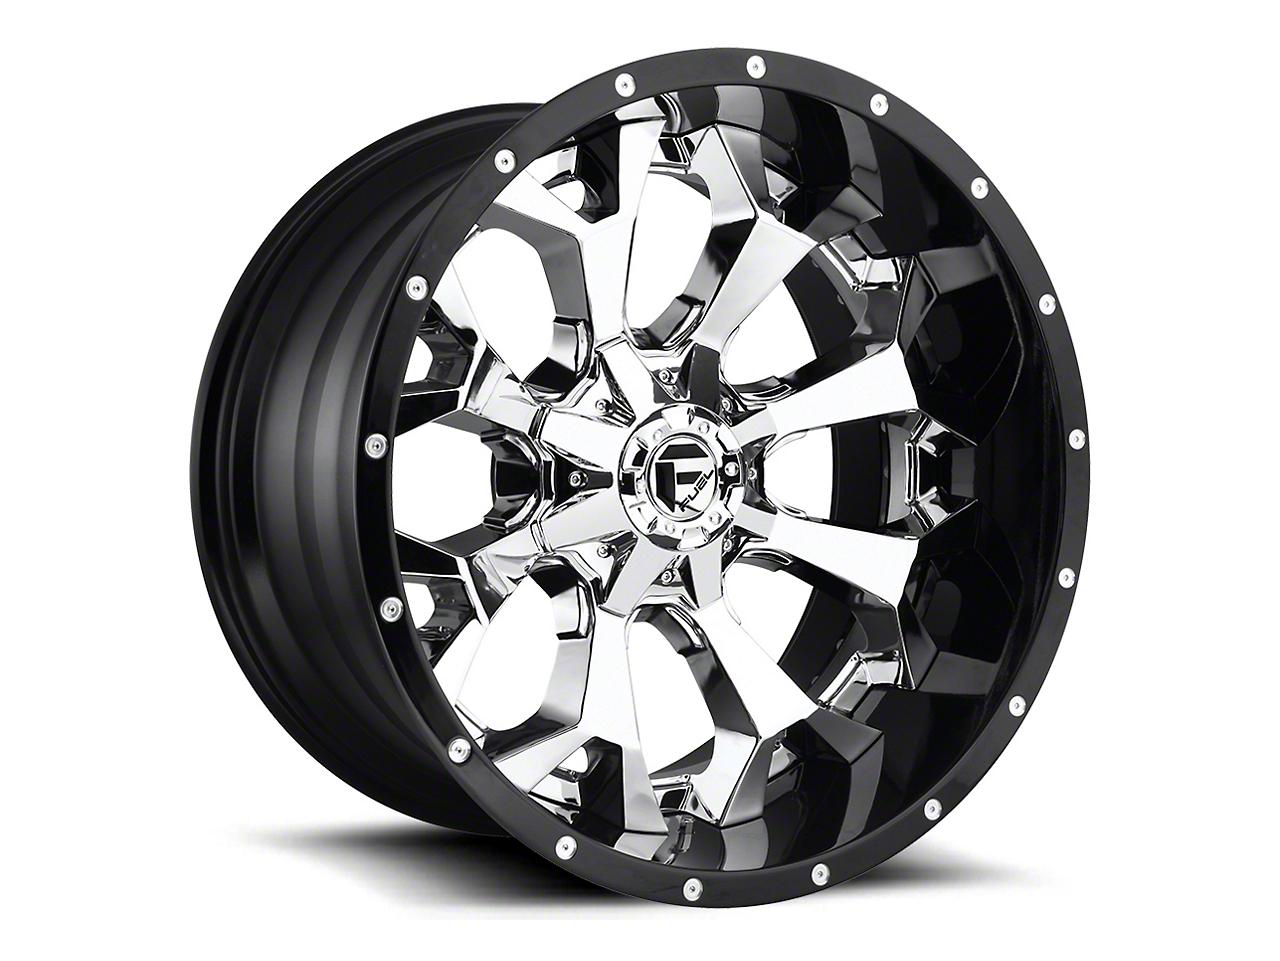 Fuel Wheels Assault Matte Black Milled 6-Lug Wheel - 22x14 (07-18 Sierra 1500)